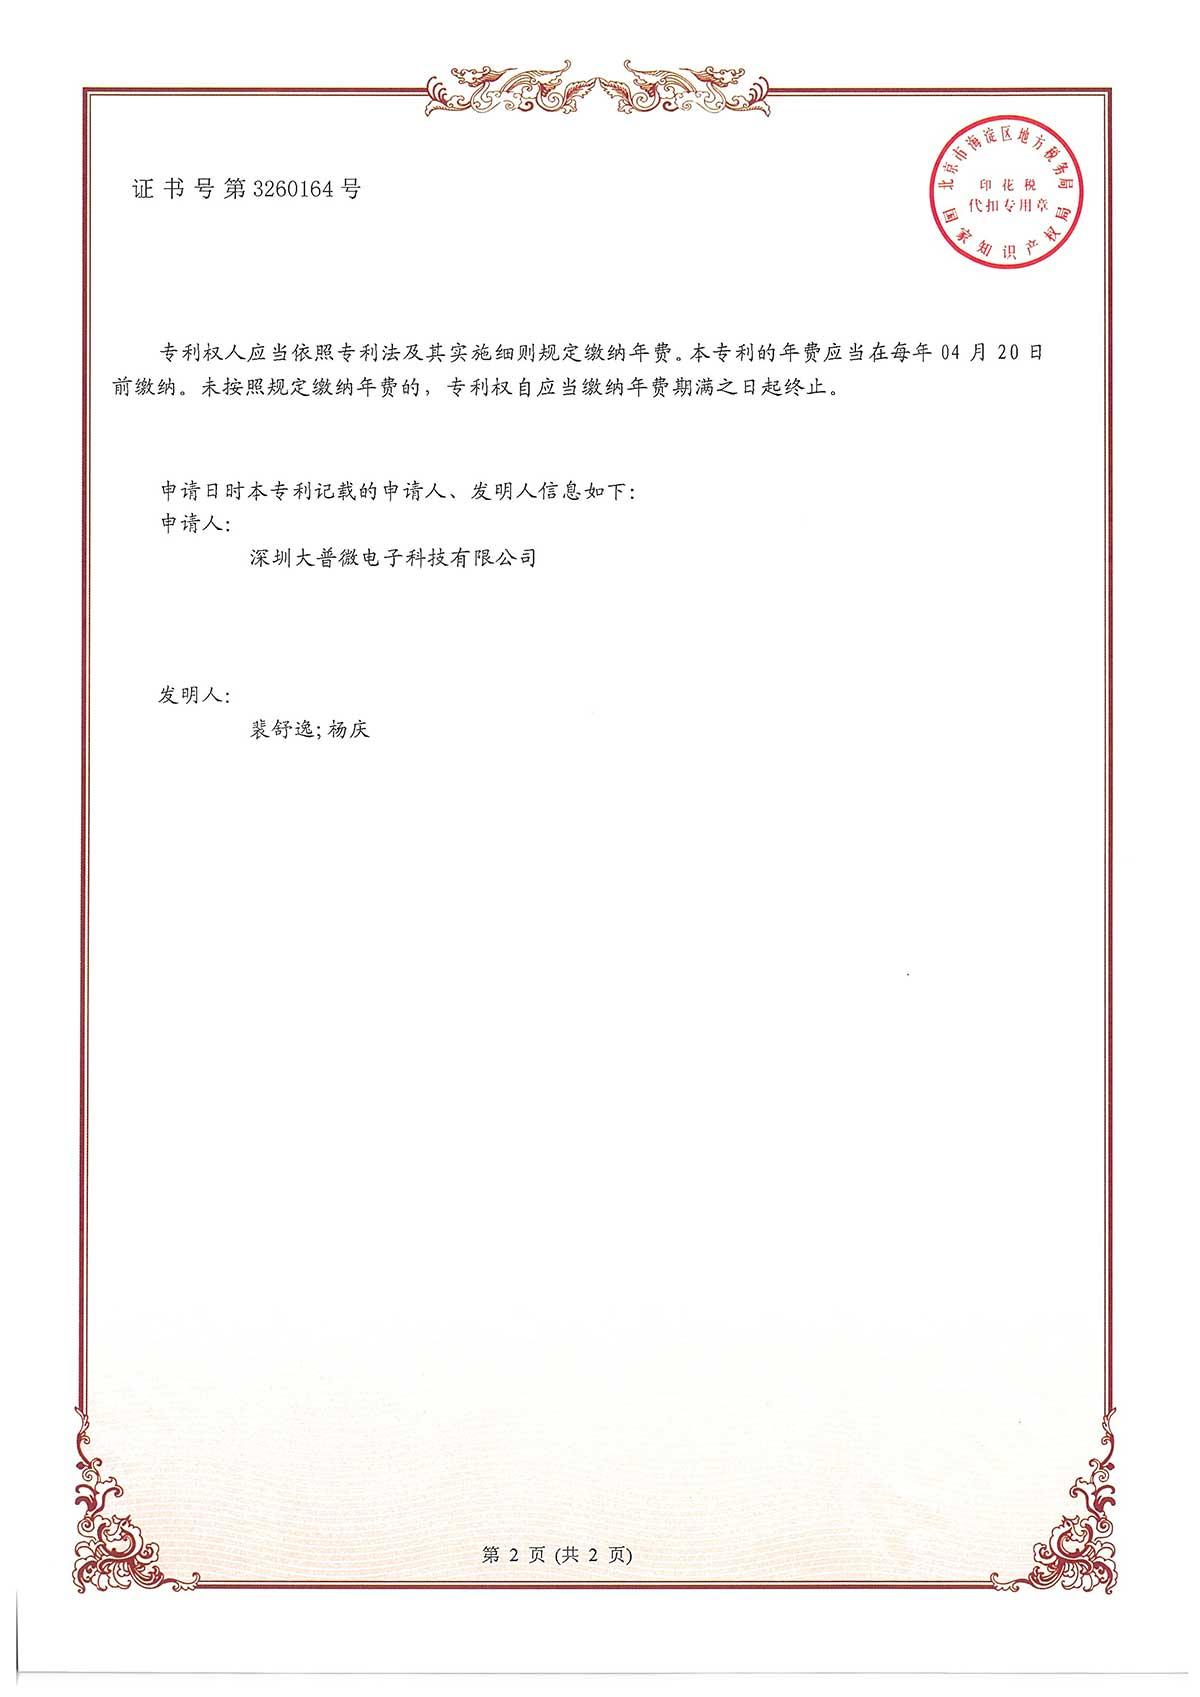 DCN1-17003 一种字符串的搜索系统及方法